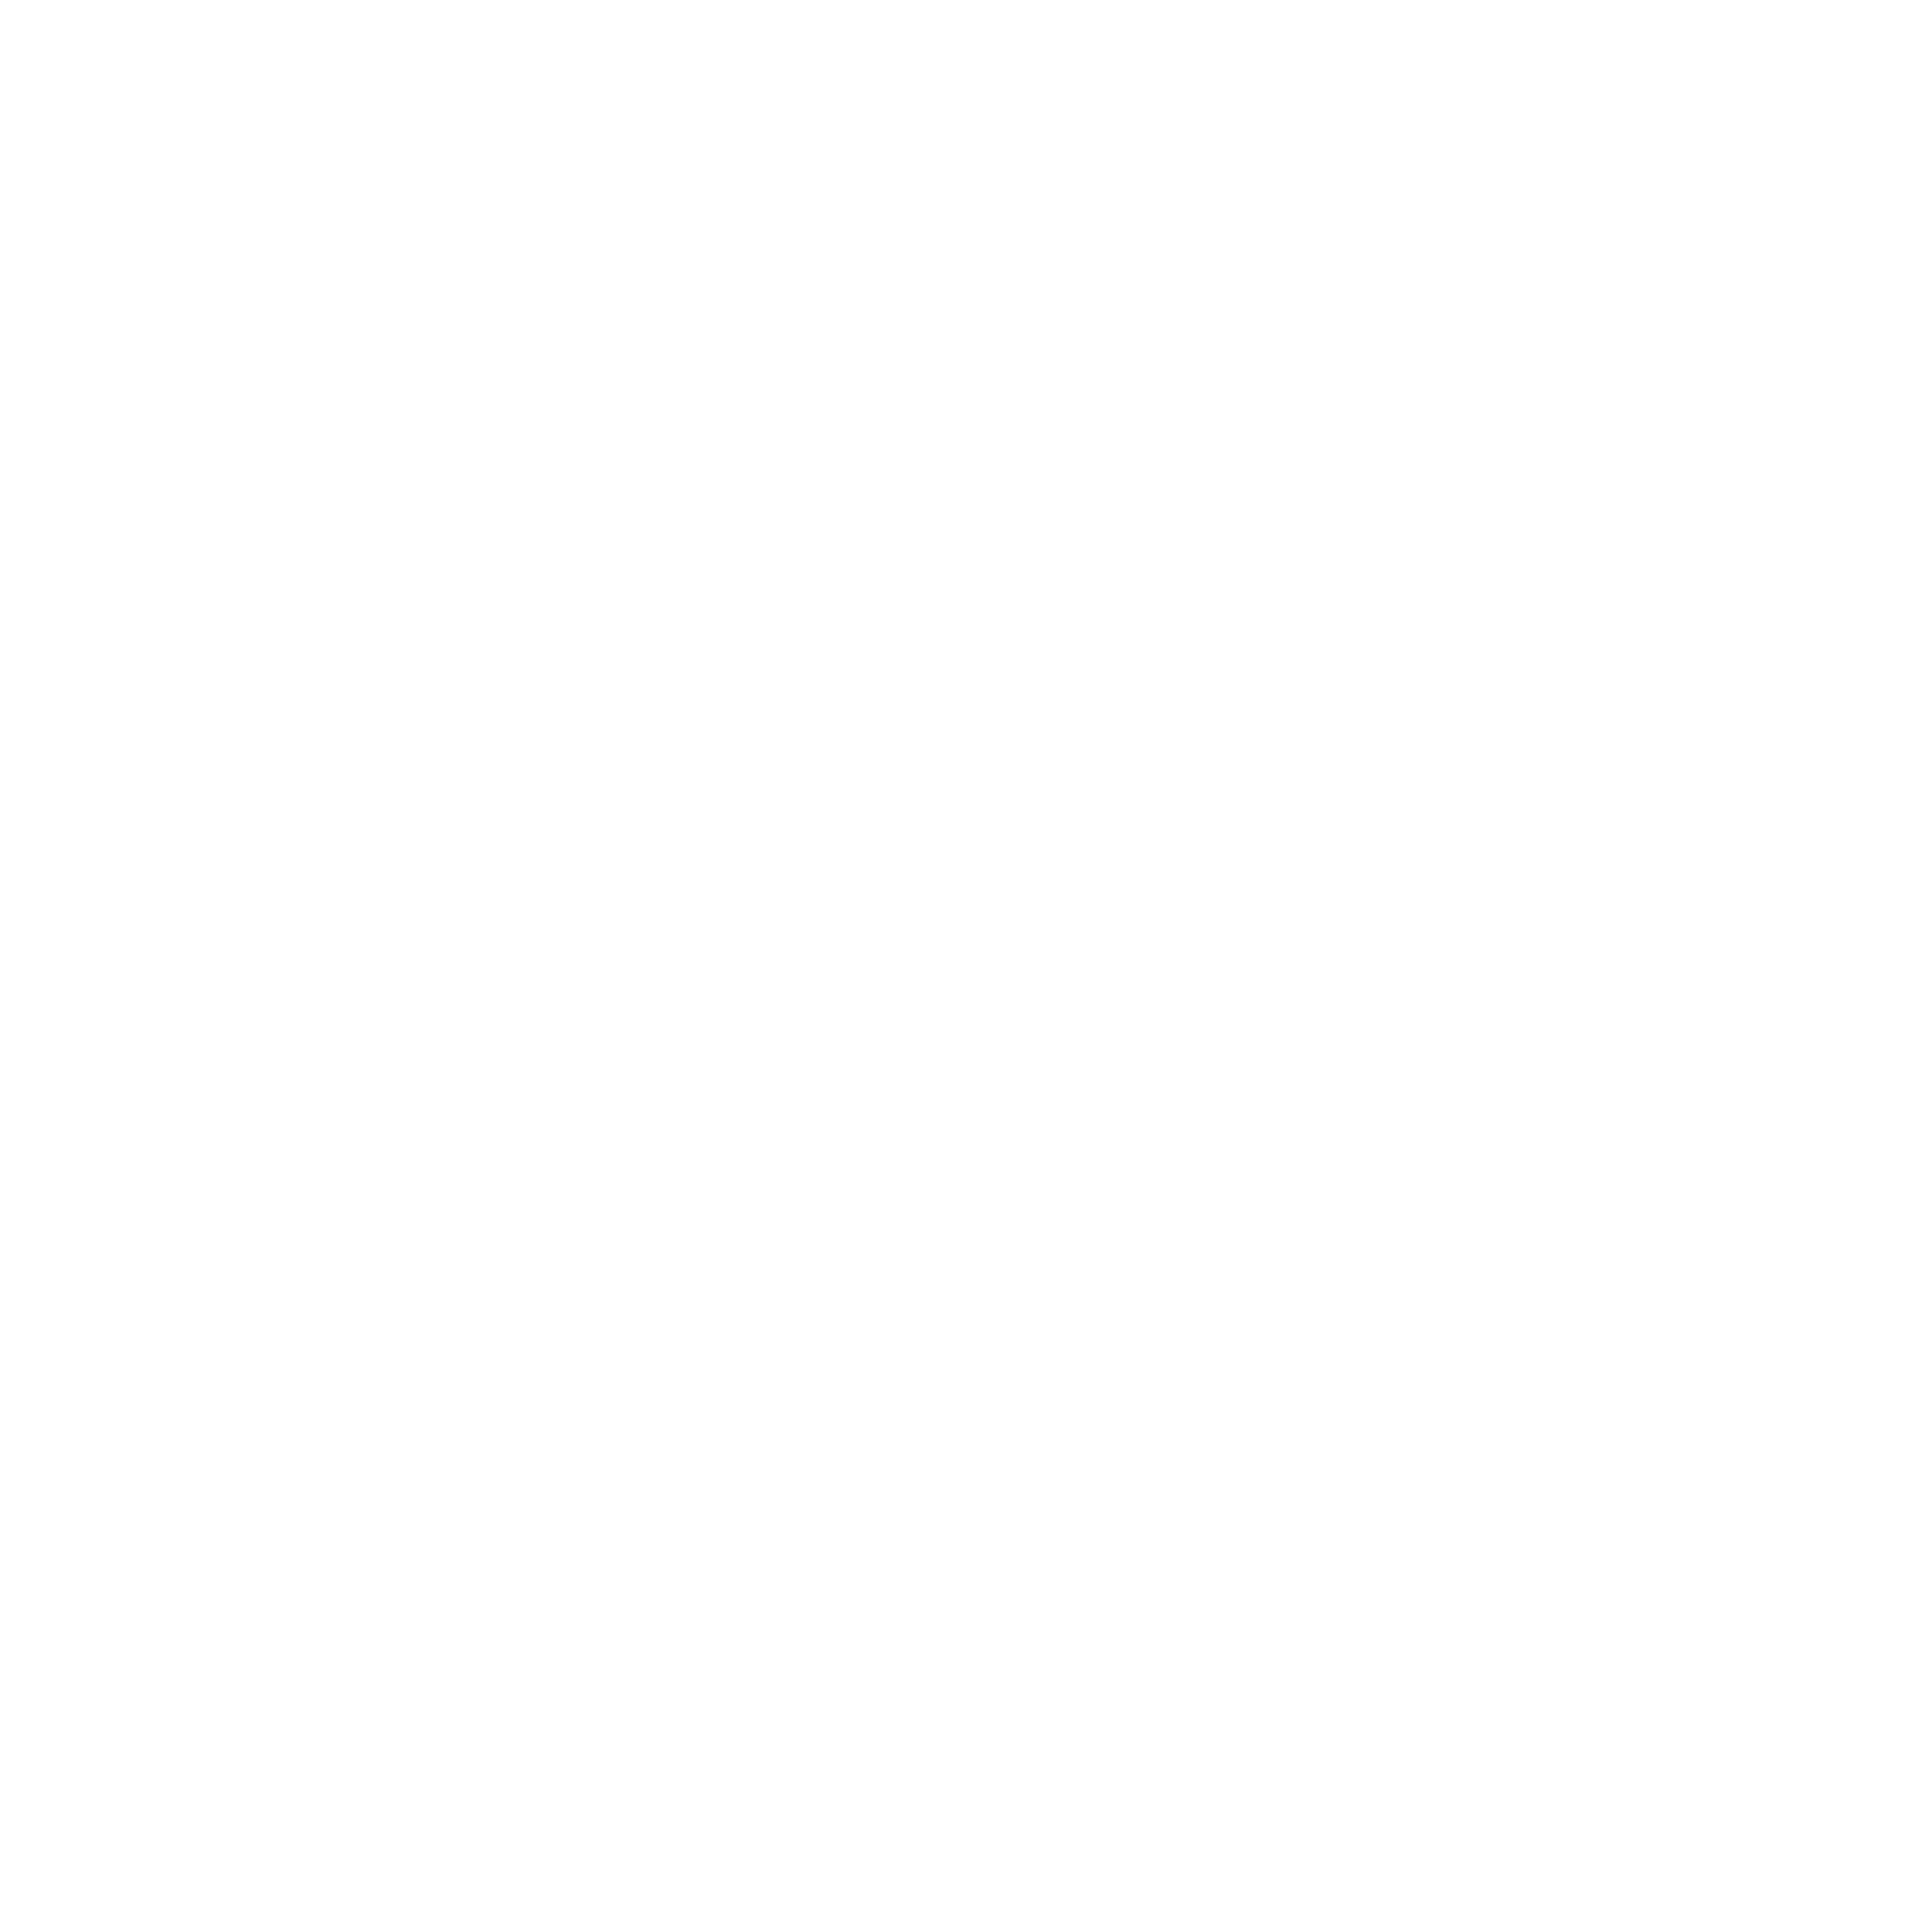 Jemere_Morgan_Logo-2019-02.png